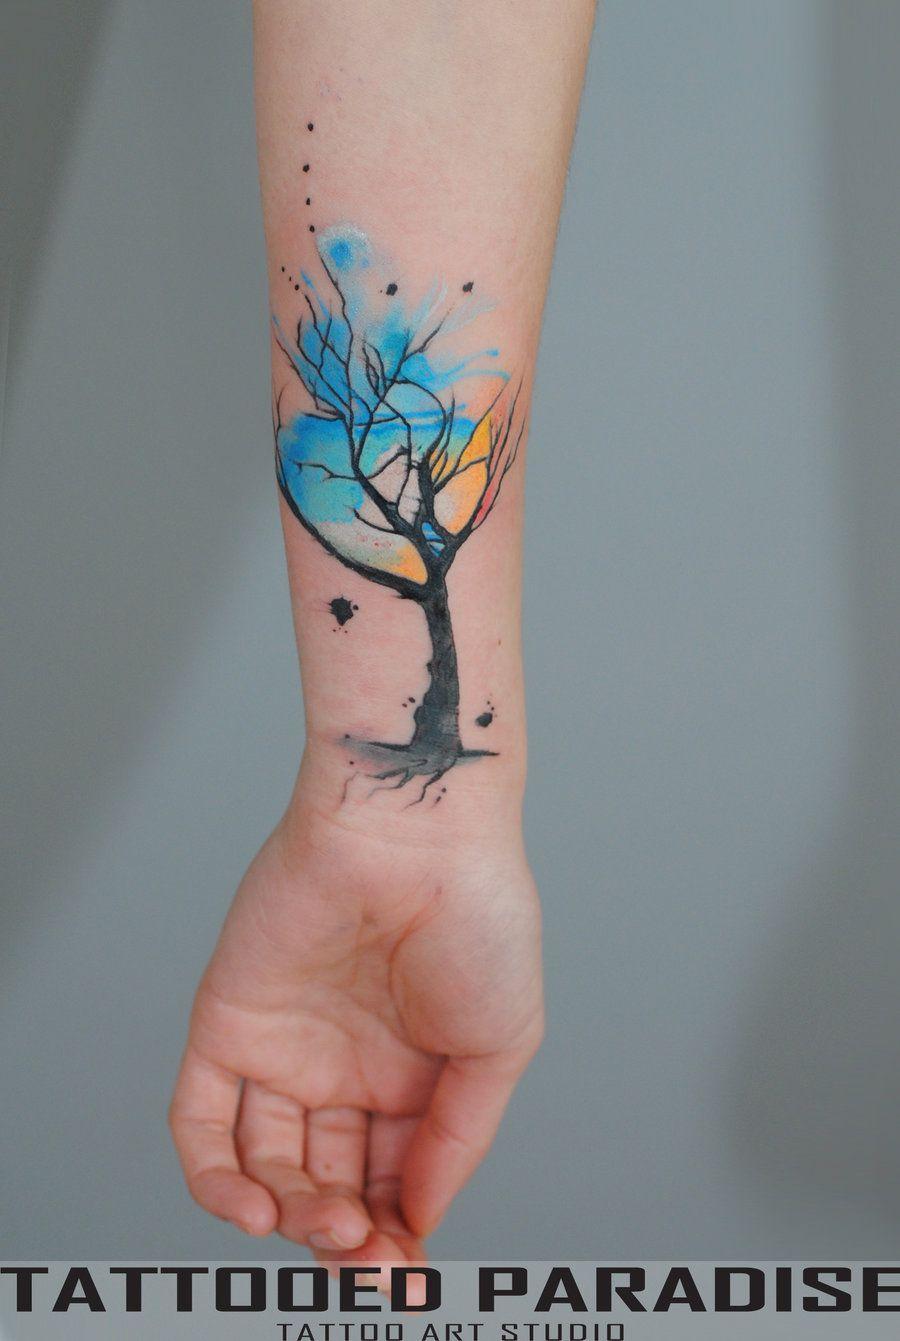 Black tattoo cover up ideas tree watercolor by dopeindulgenceviantart on deviantart